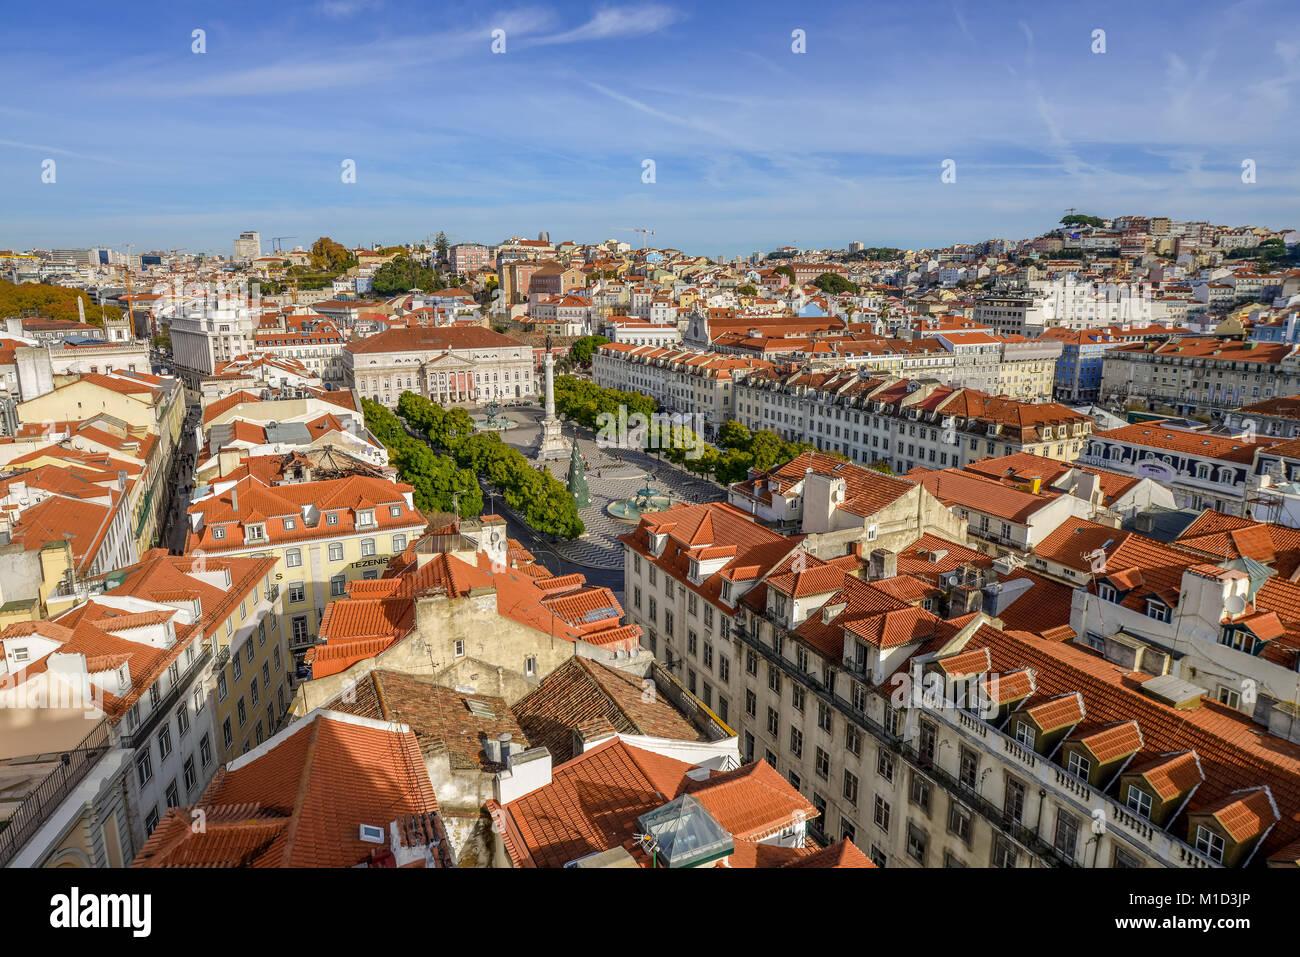 Overview, Rossio Square, Old Town, Lisbon, Portugal, Uebersicht, Rossio-Platz, Altstadt, Lissabon - Stock Image